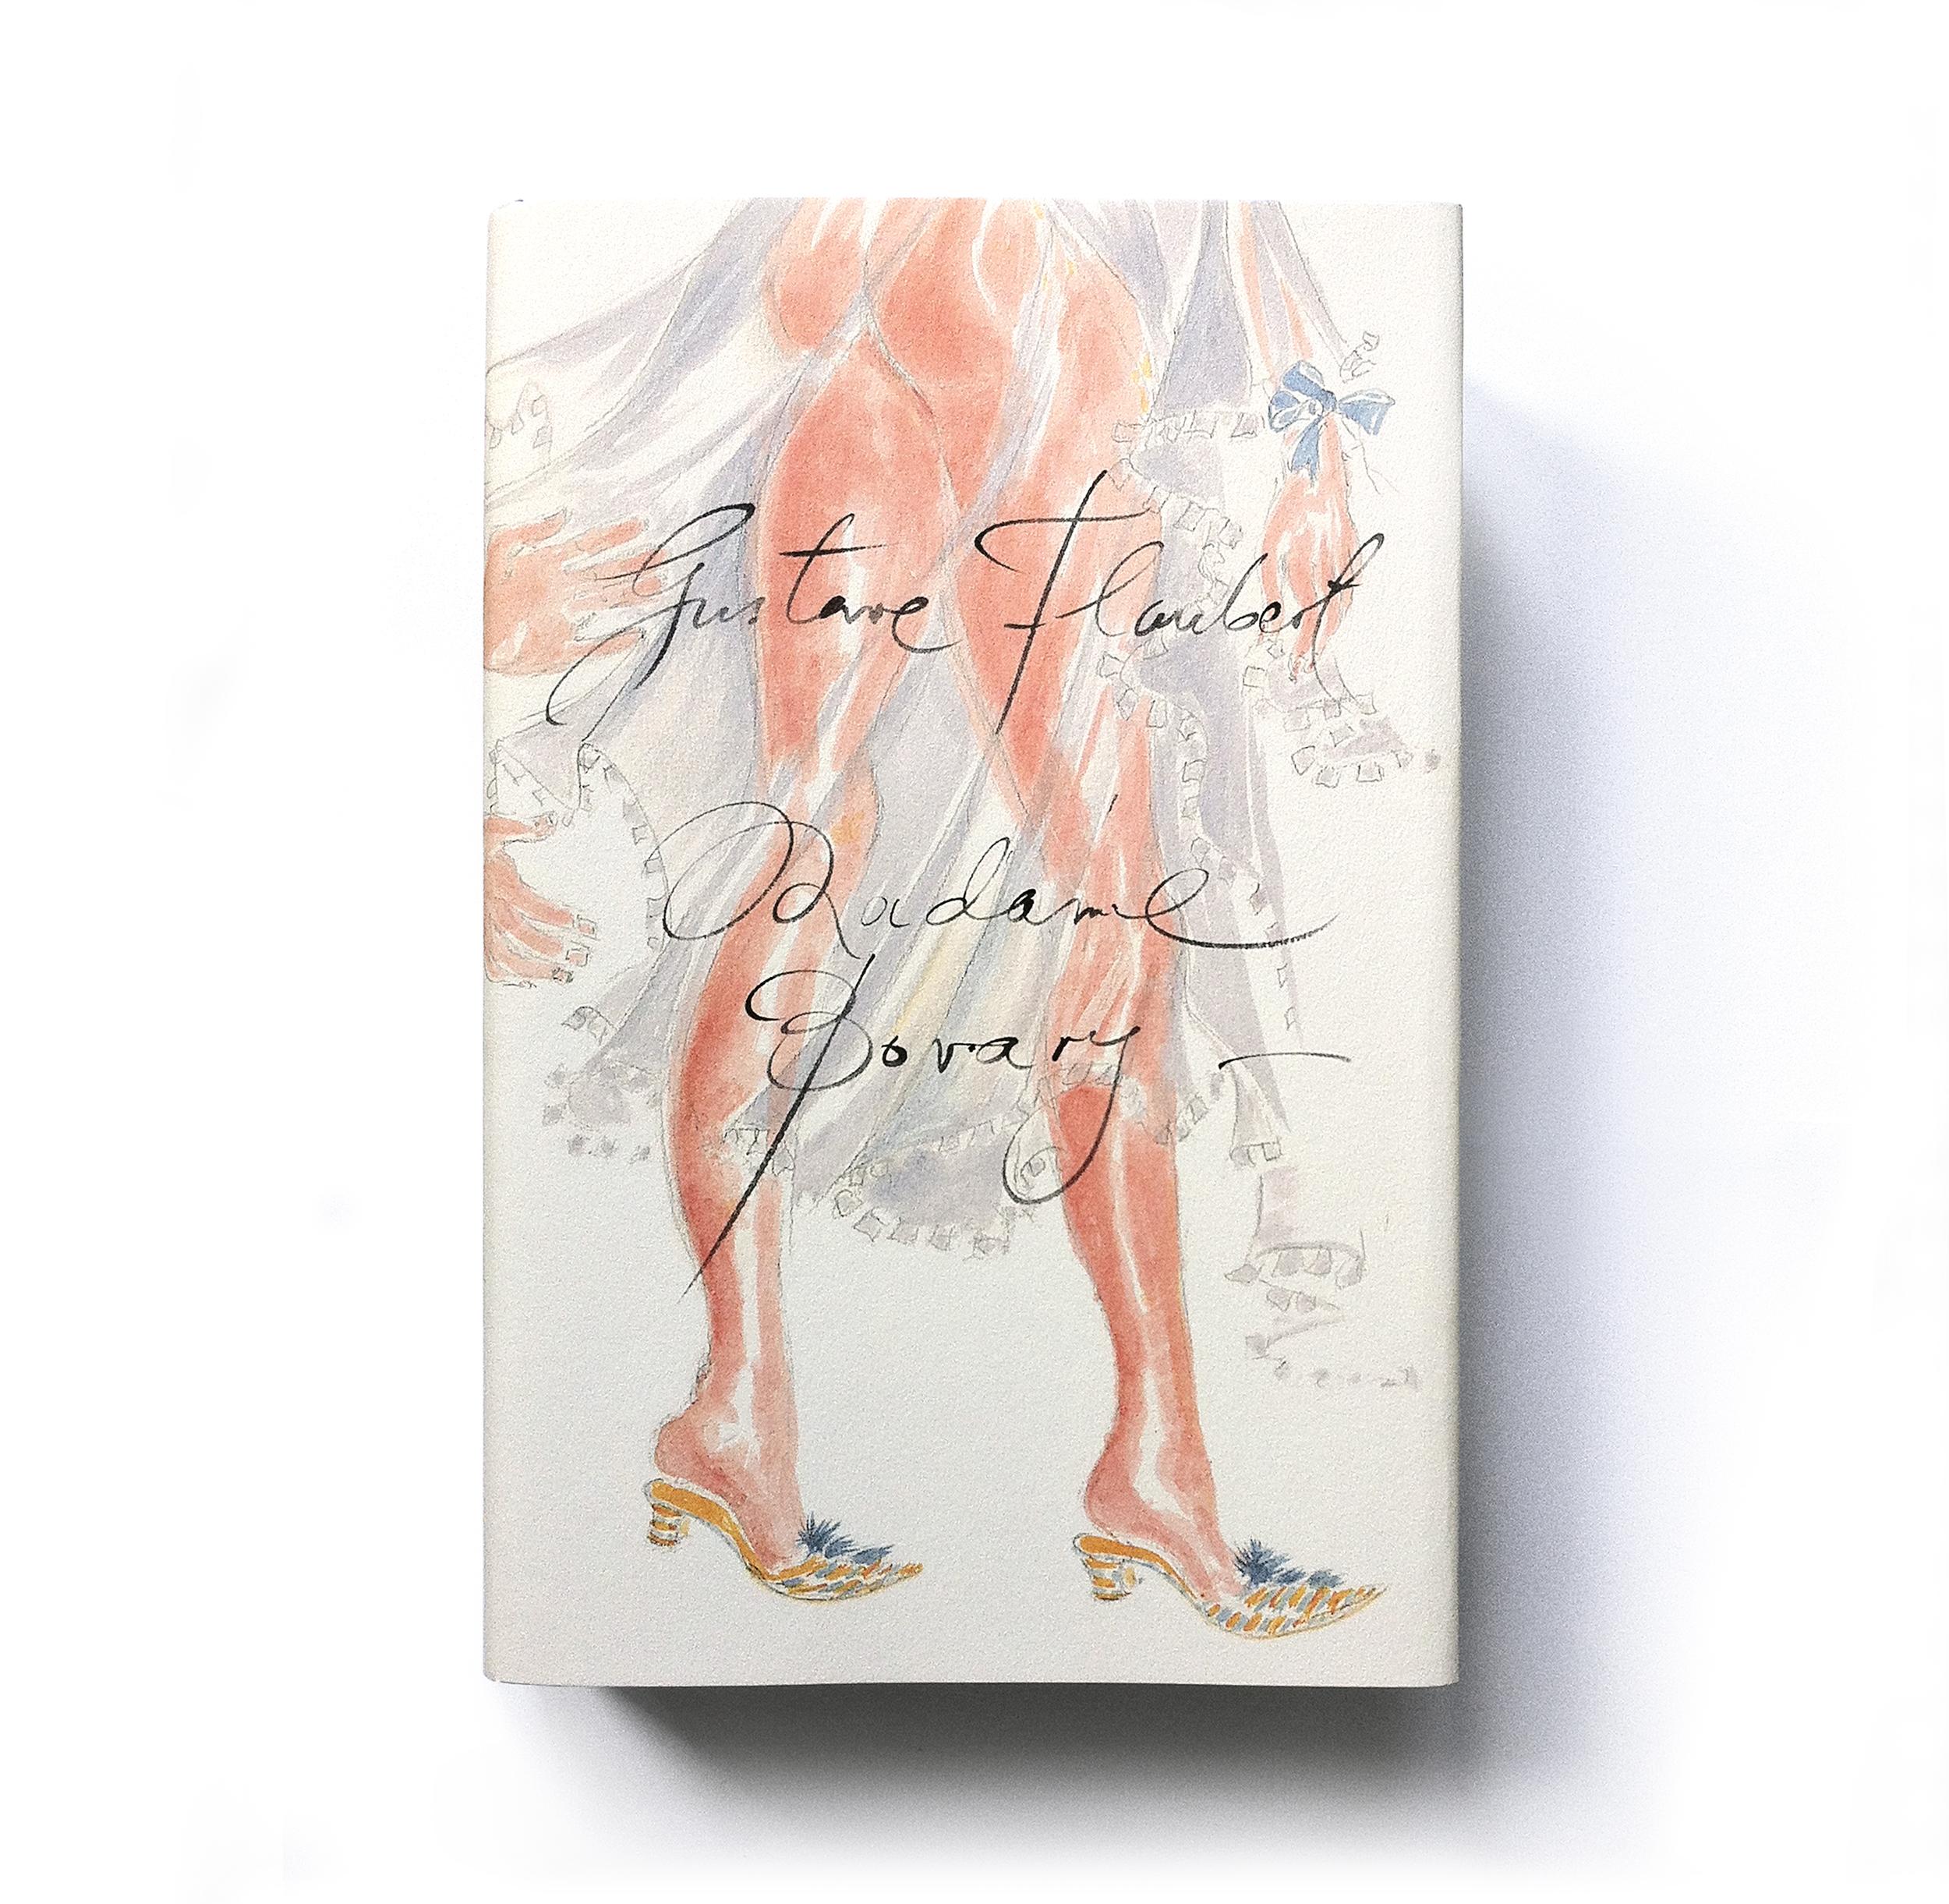 Madame Bovary by Gustave Flaubert (Penguin Classics 60th anniversary hardback) - Art & lettering: Manolo Blahnik Design: Jim Stoddart